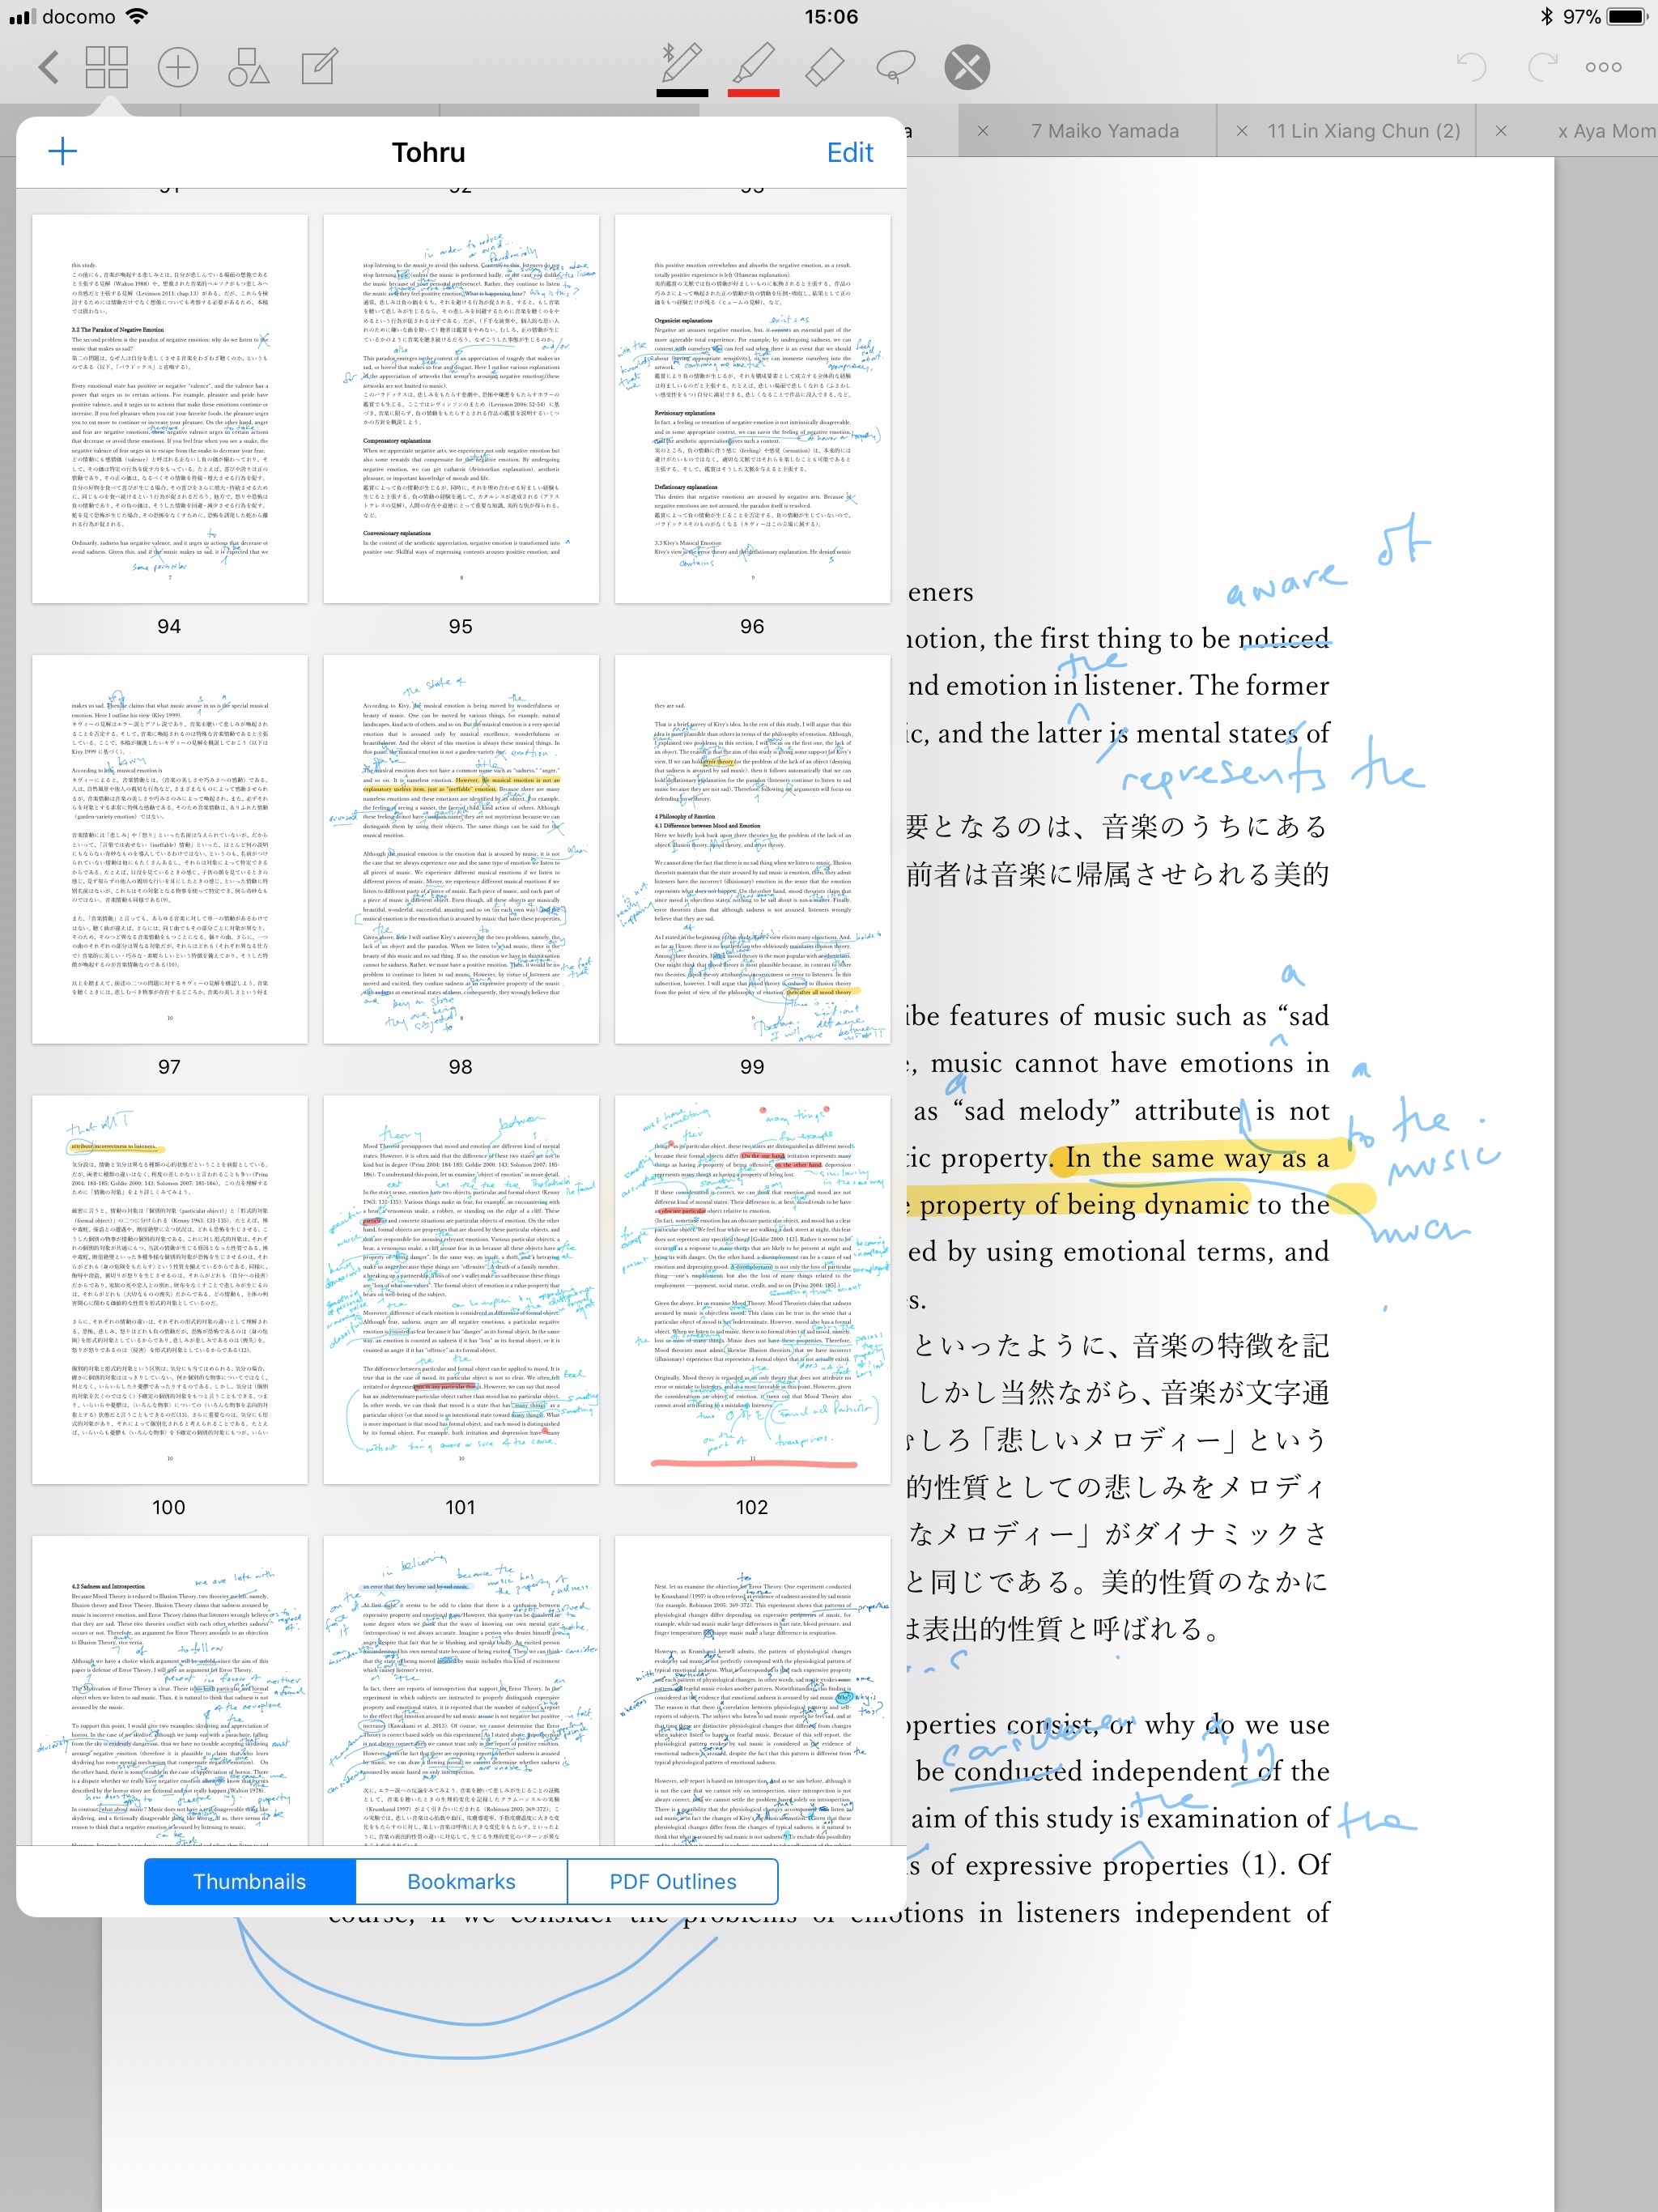 note_tohru.jpg